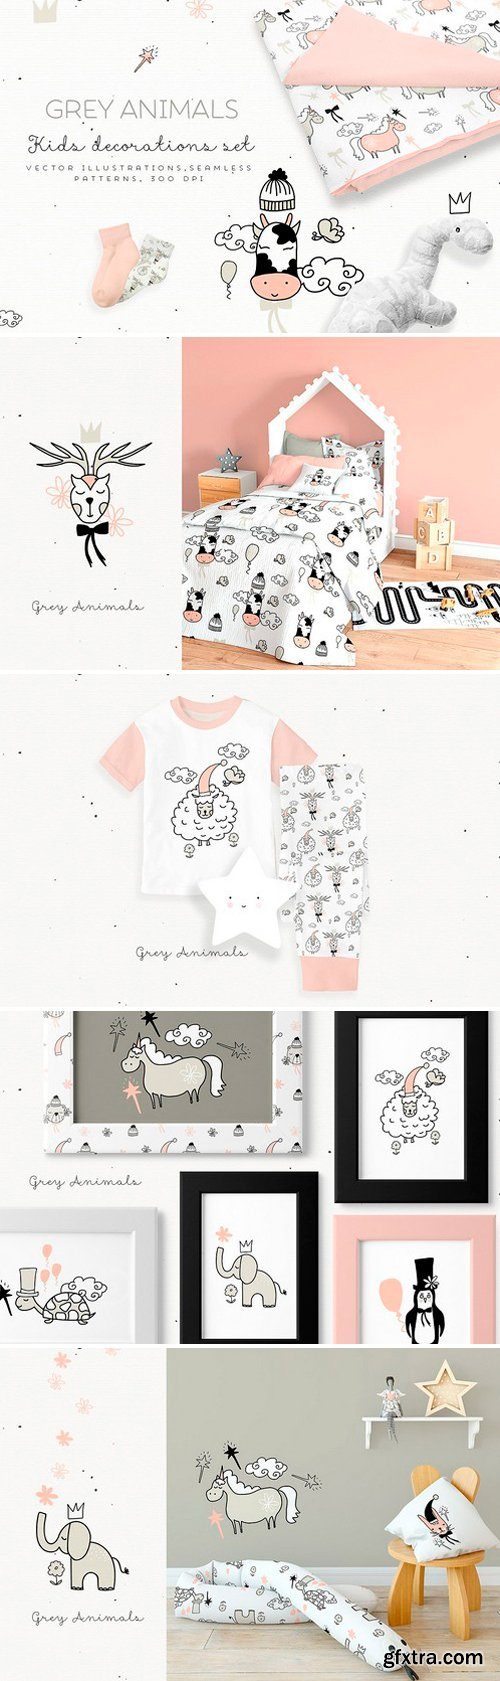 CM - Grey Animals 2187309